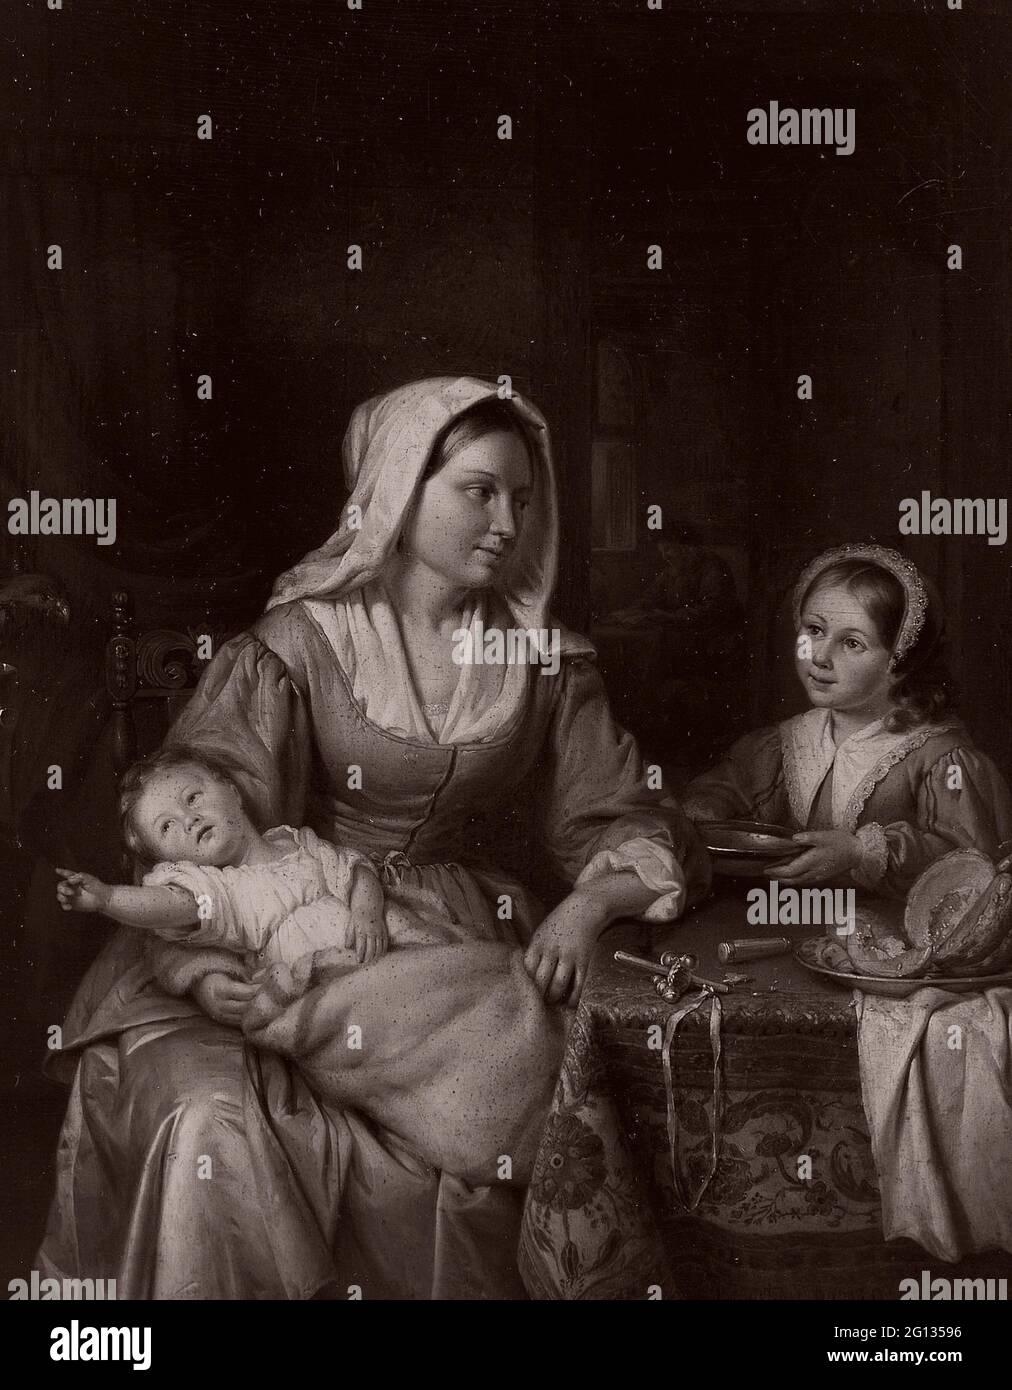 Author: Adriaan de Lelie. Mother and Two Children with Still Life - 1810 - Adriaen de Lelie Dutch, 1755-1820. Oil on panel. Holland. Stock Photo